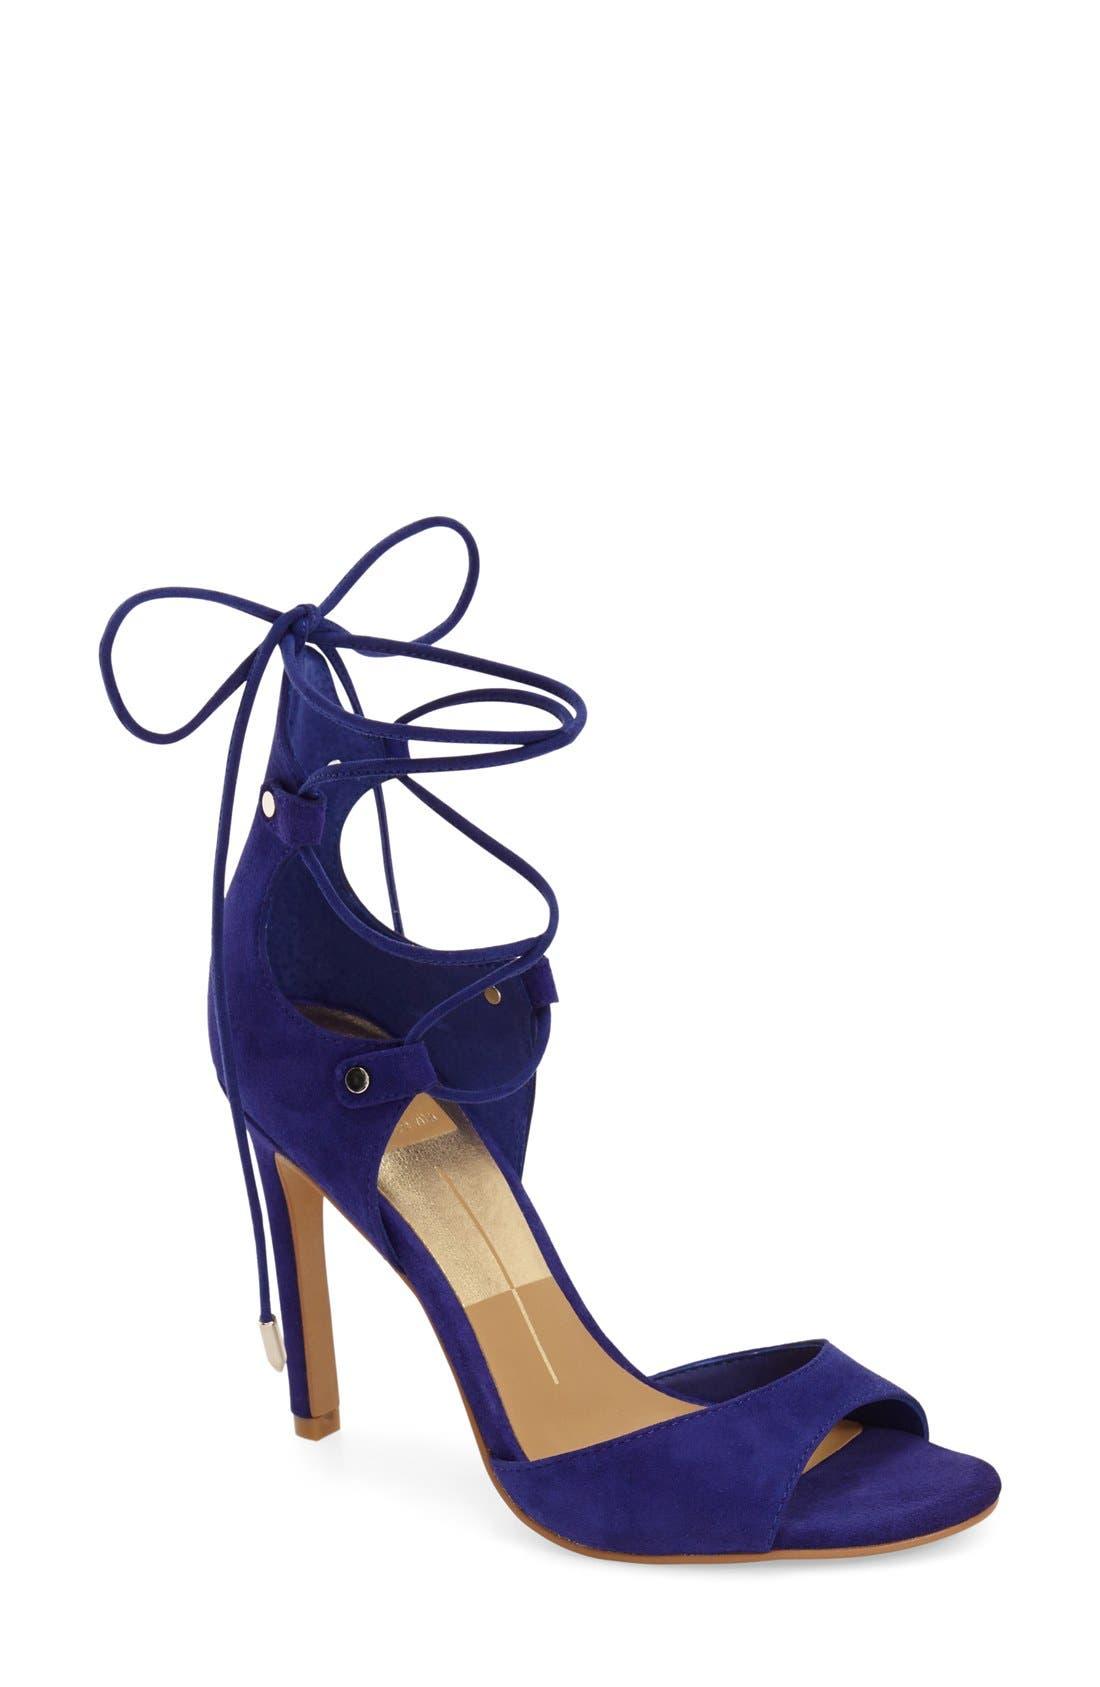 'Hazely' Lace-Up Sandal,                             Main thumbnail 1, color,                             Blue Suede